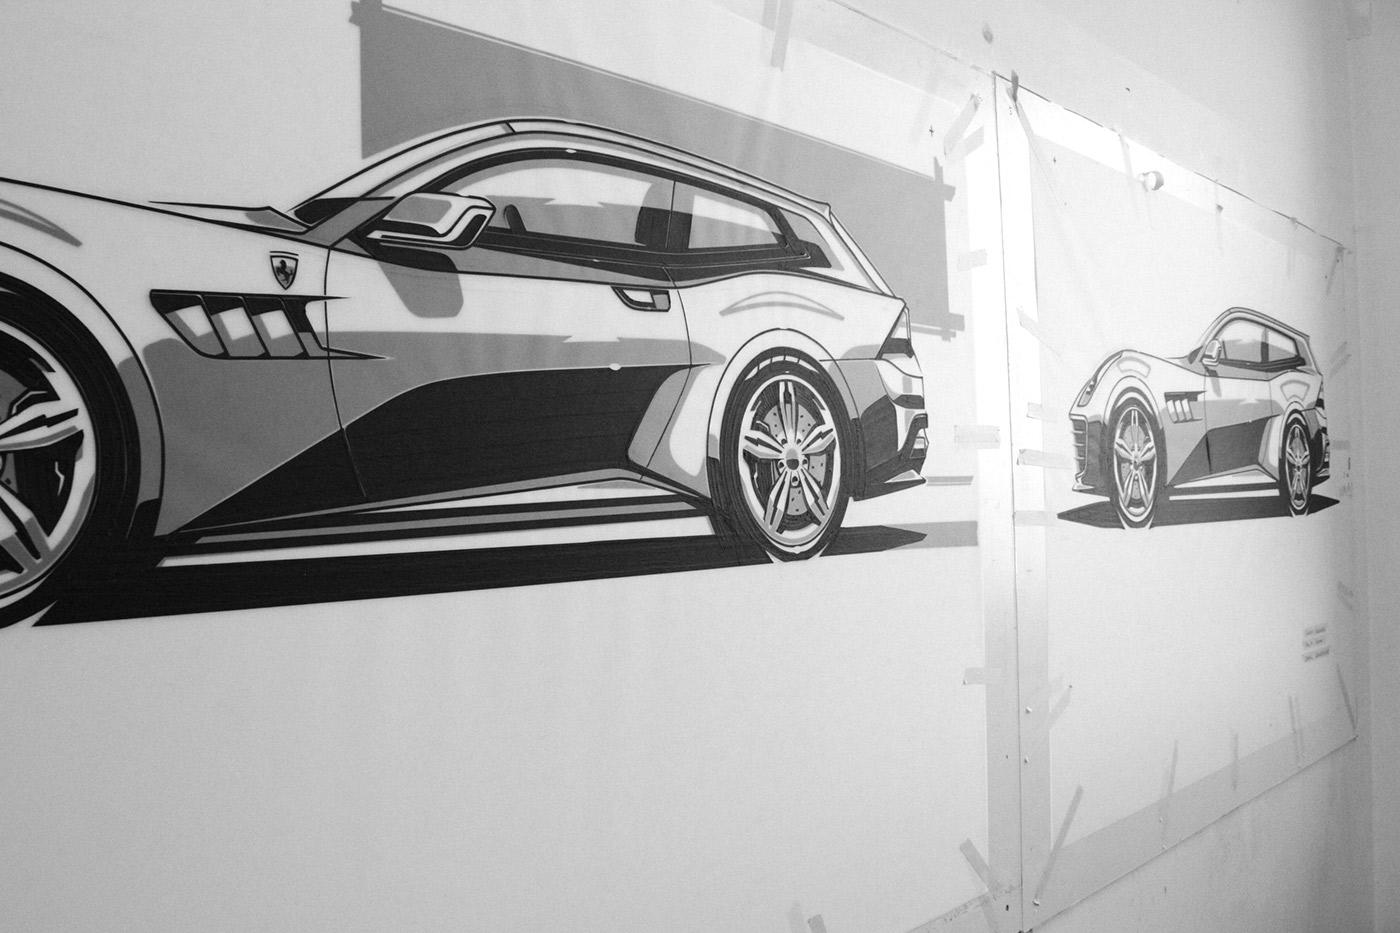 Tape Rendering FH Joanneum industrial design school rendering Technique car FERRARI automotive   University